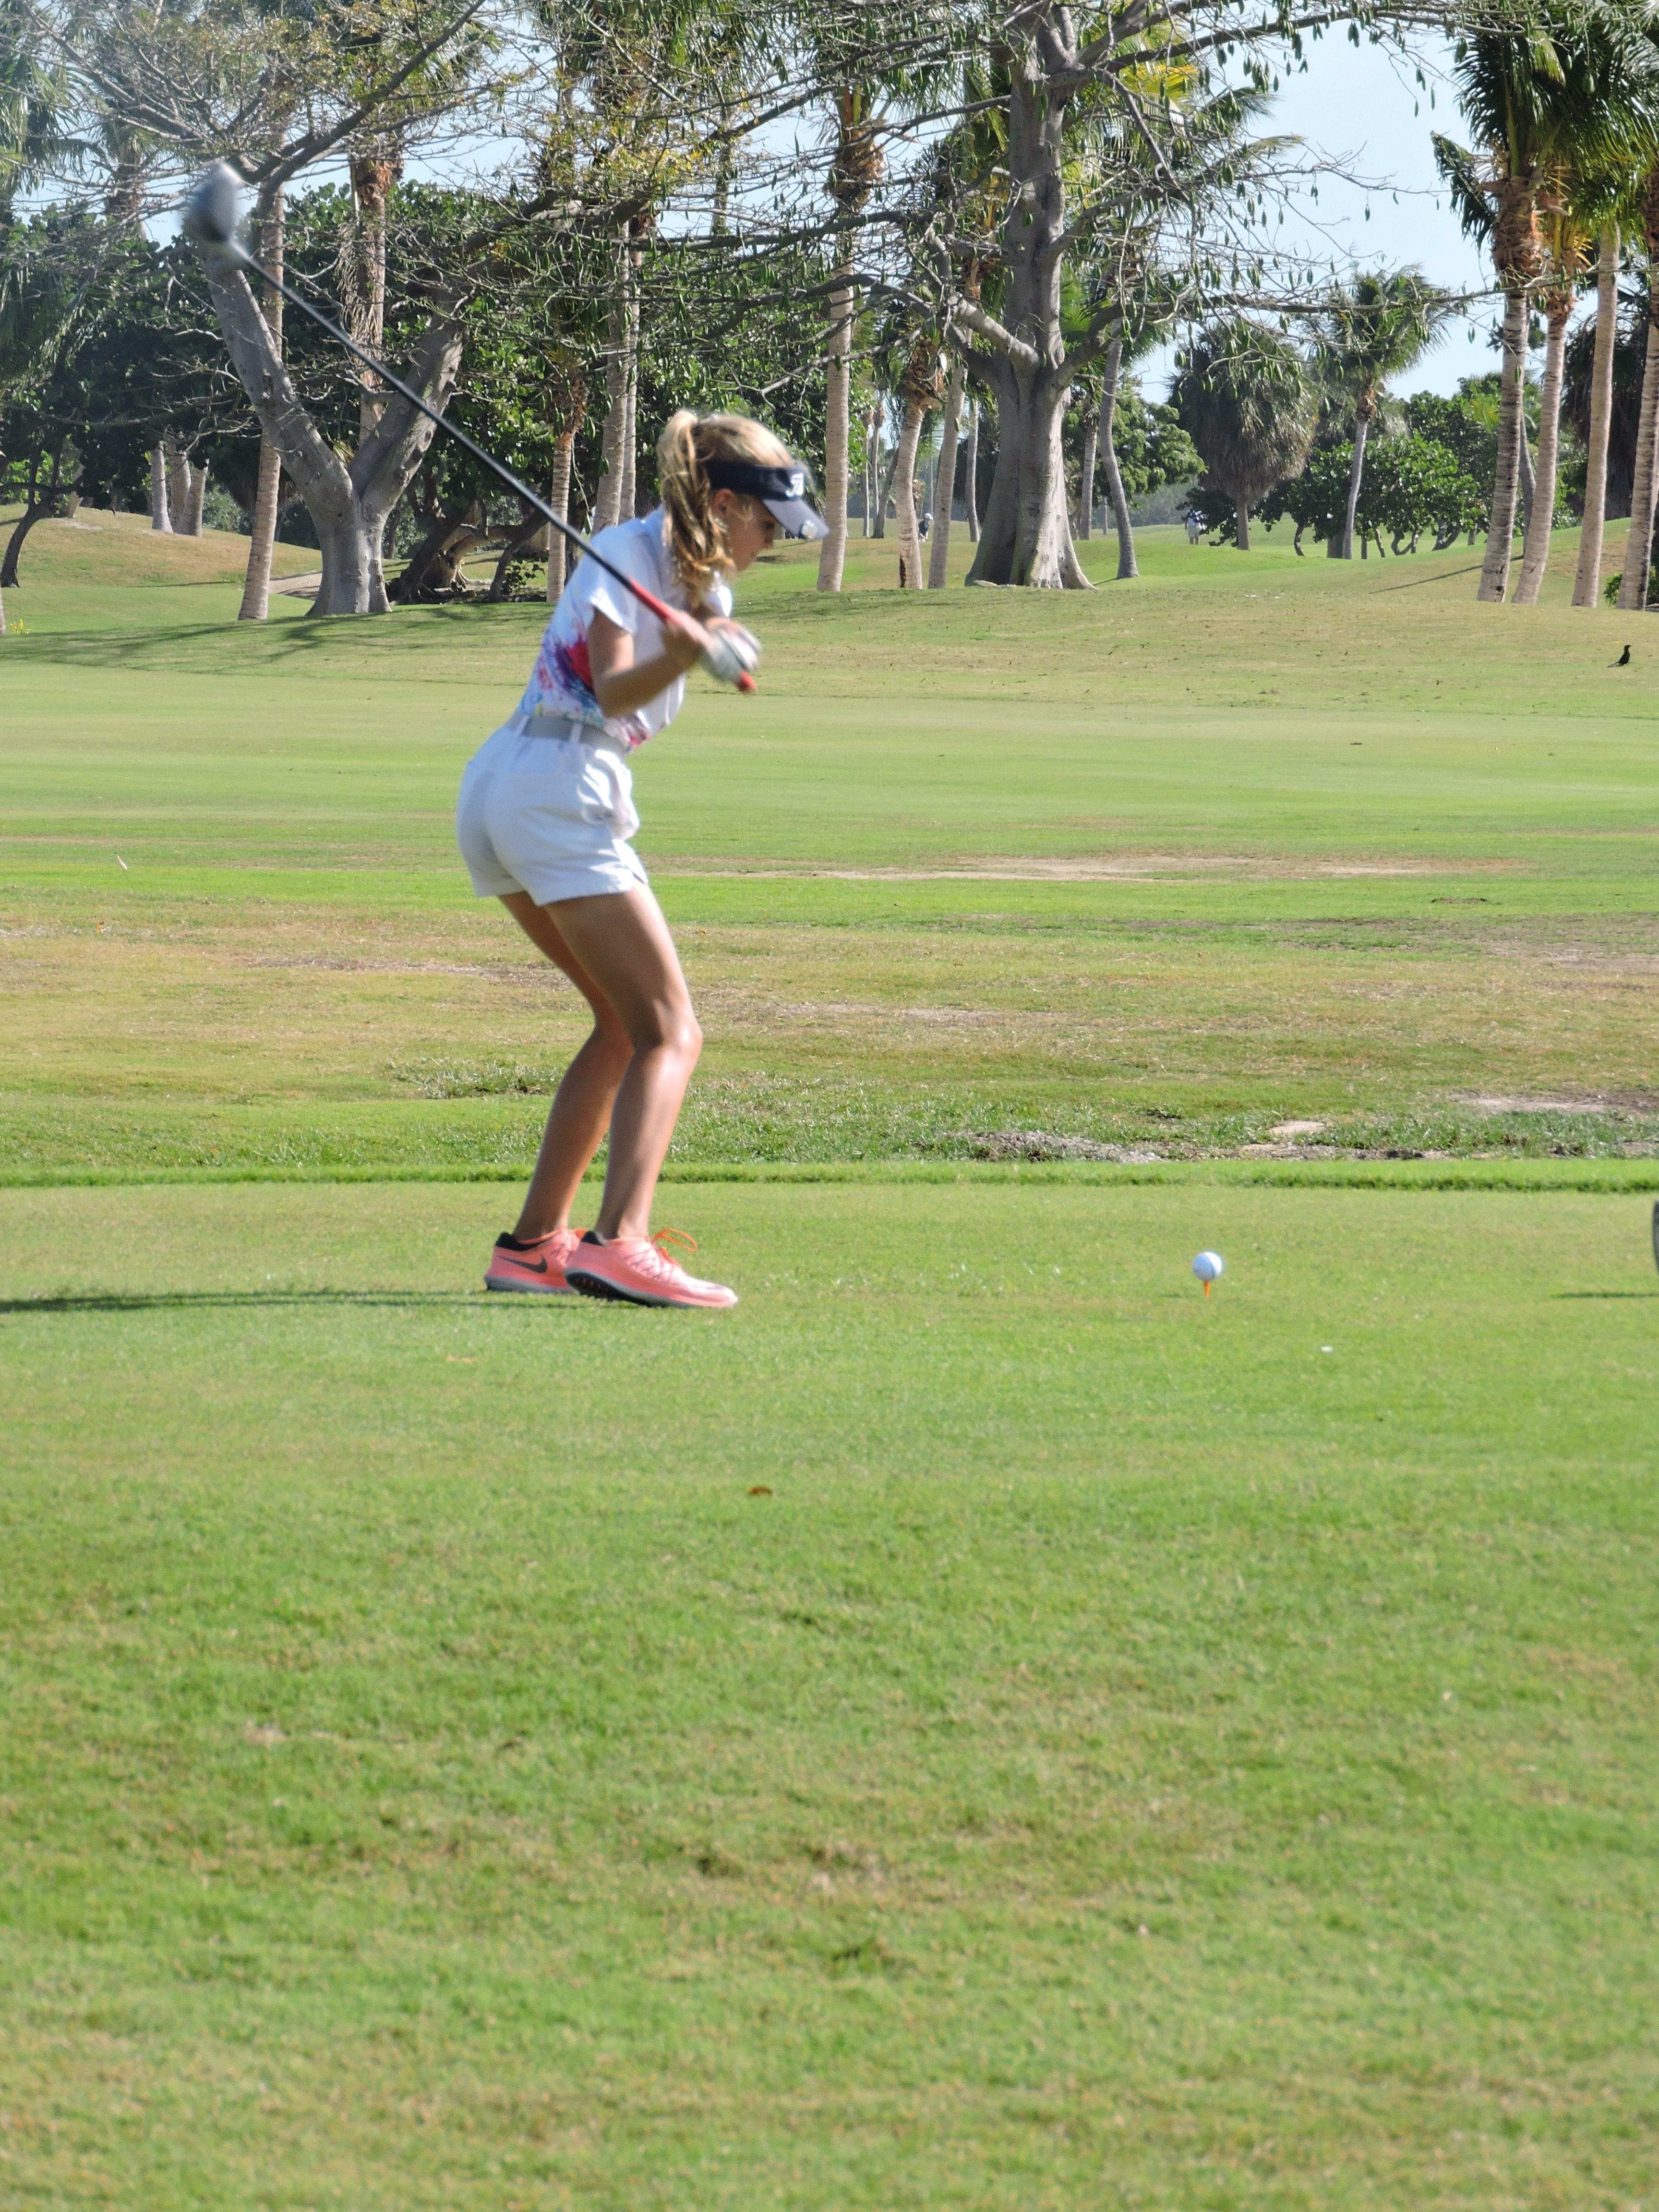 Holly Mclean - 4th hole